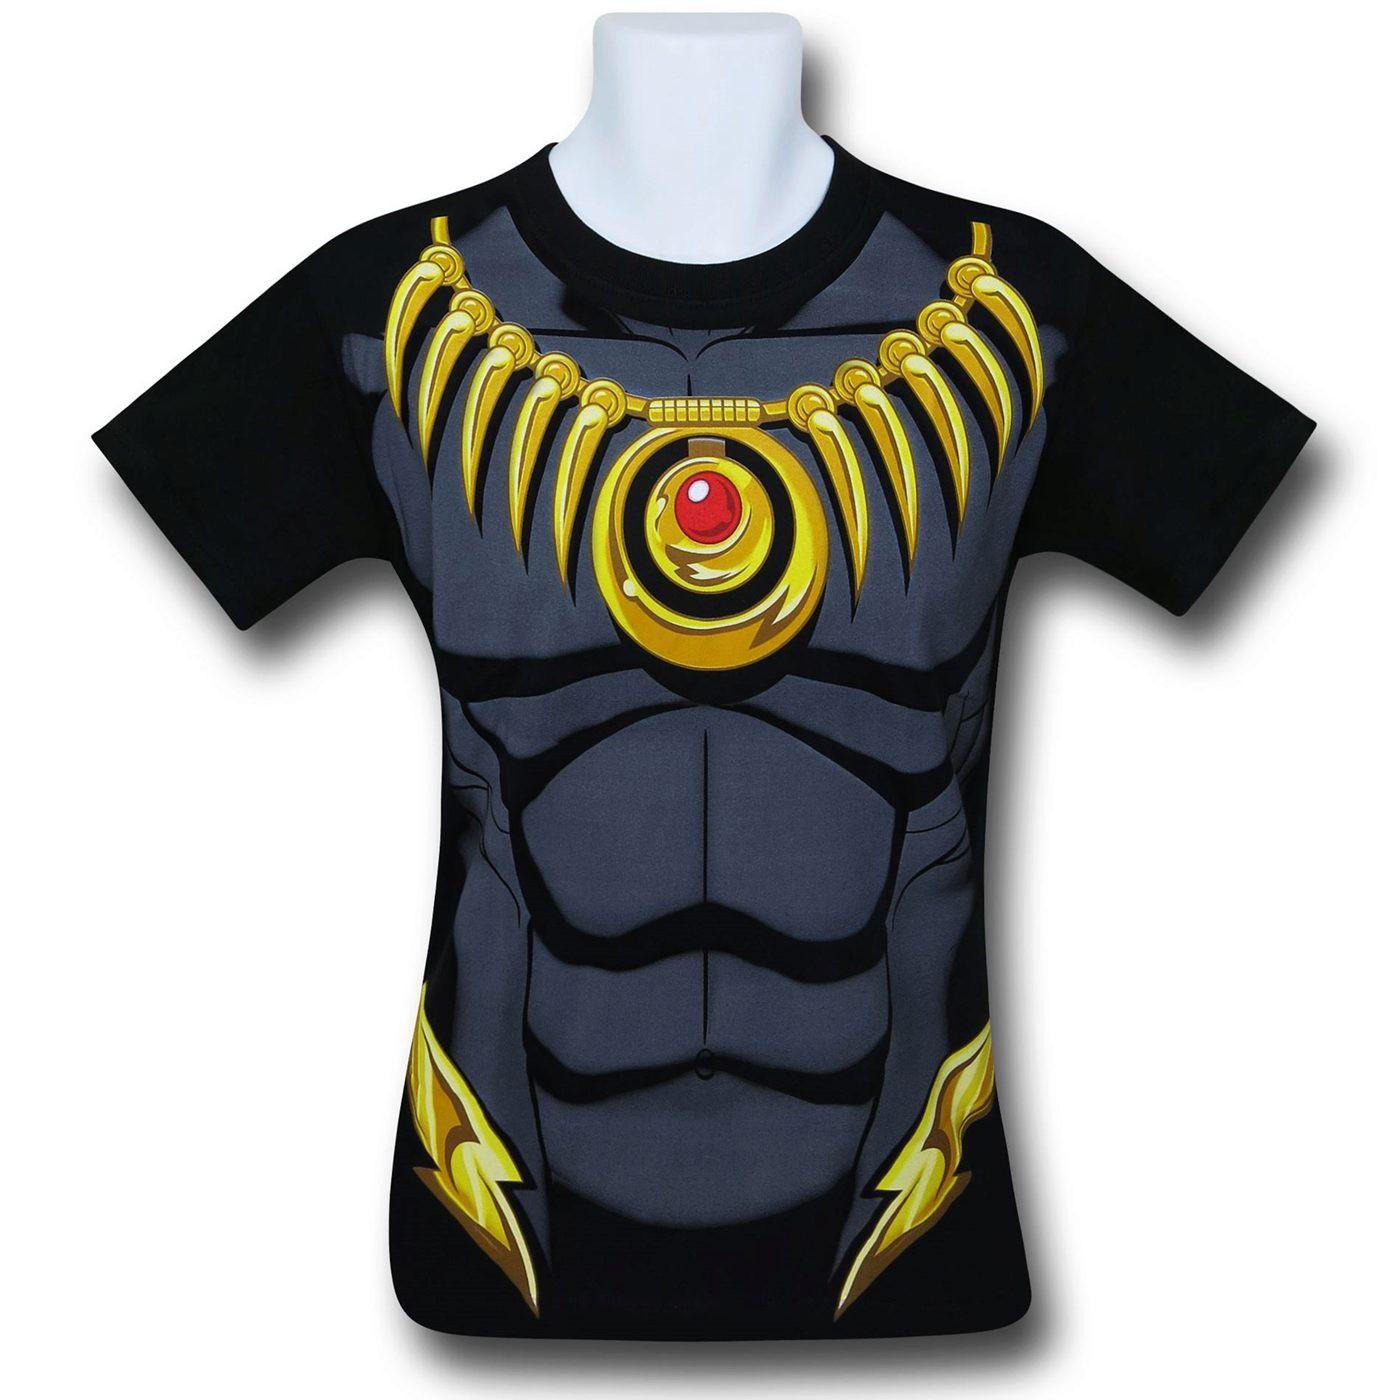 Black Panther Costume 30 Single T-Shirt